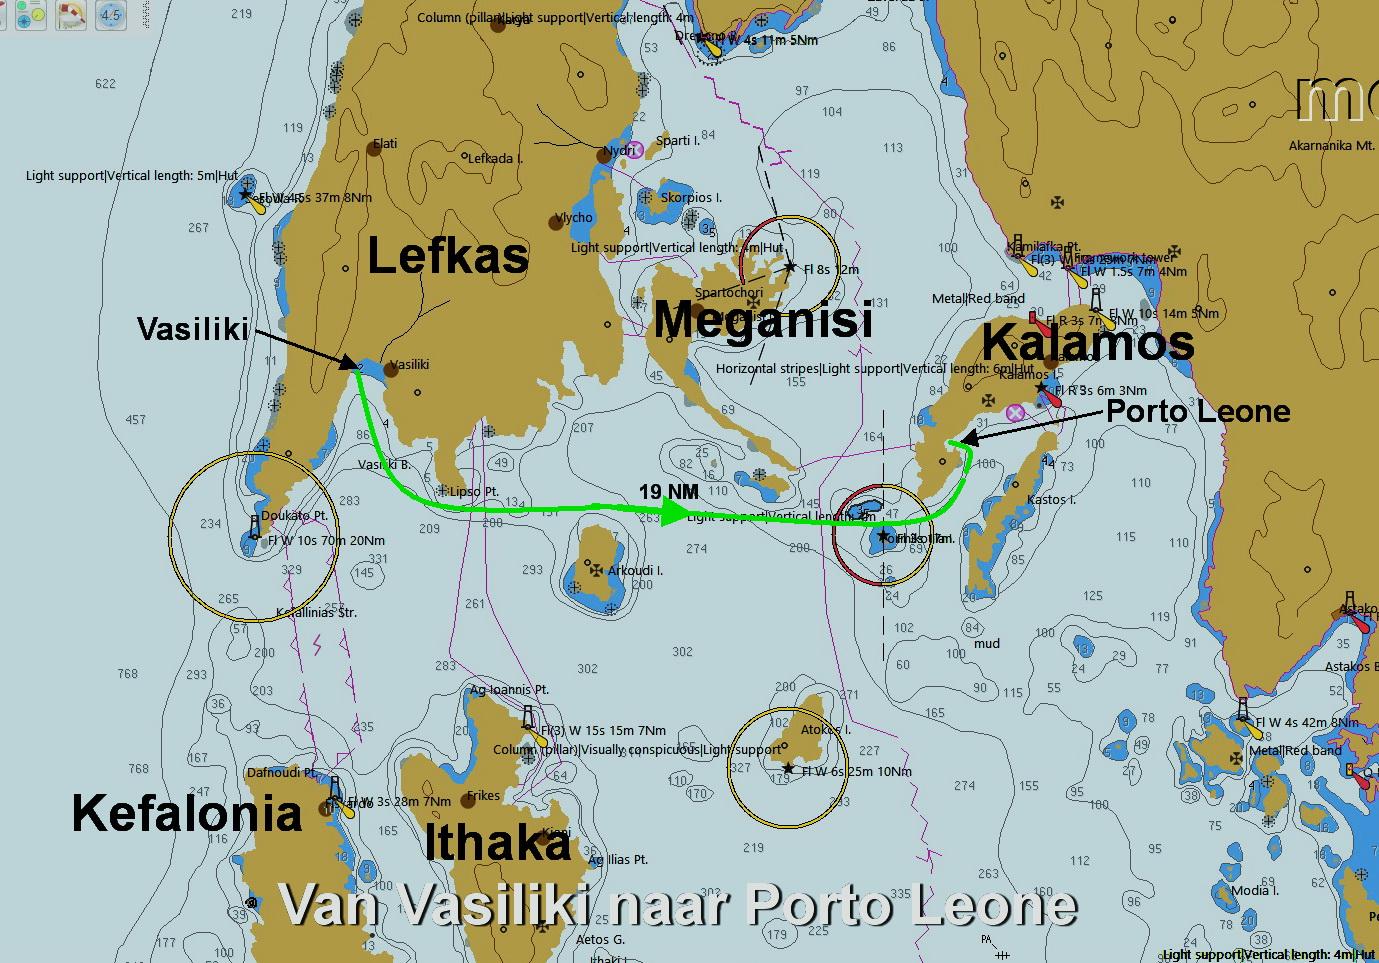 Van Vasiliki naar Porto Leone